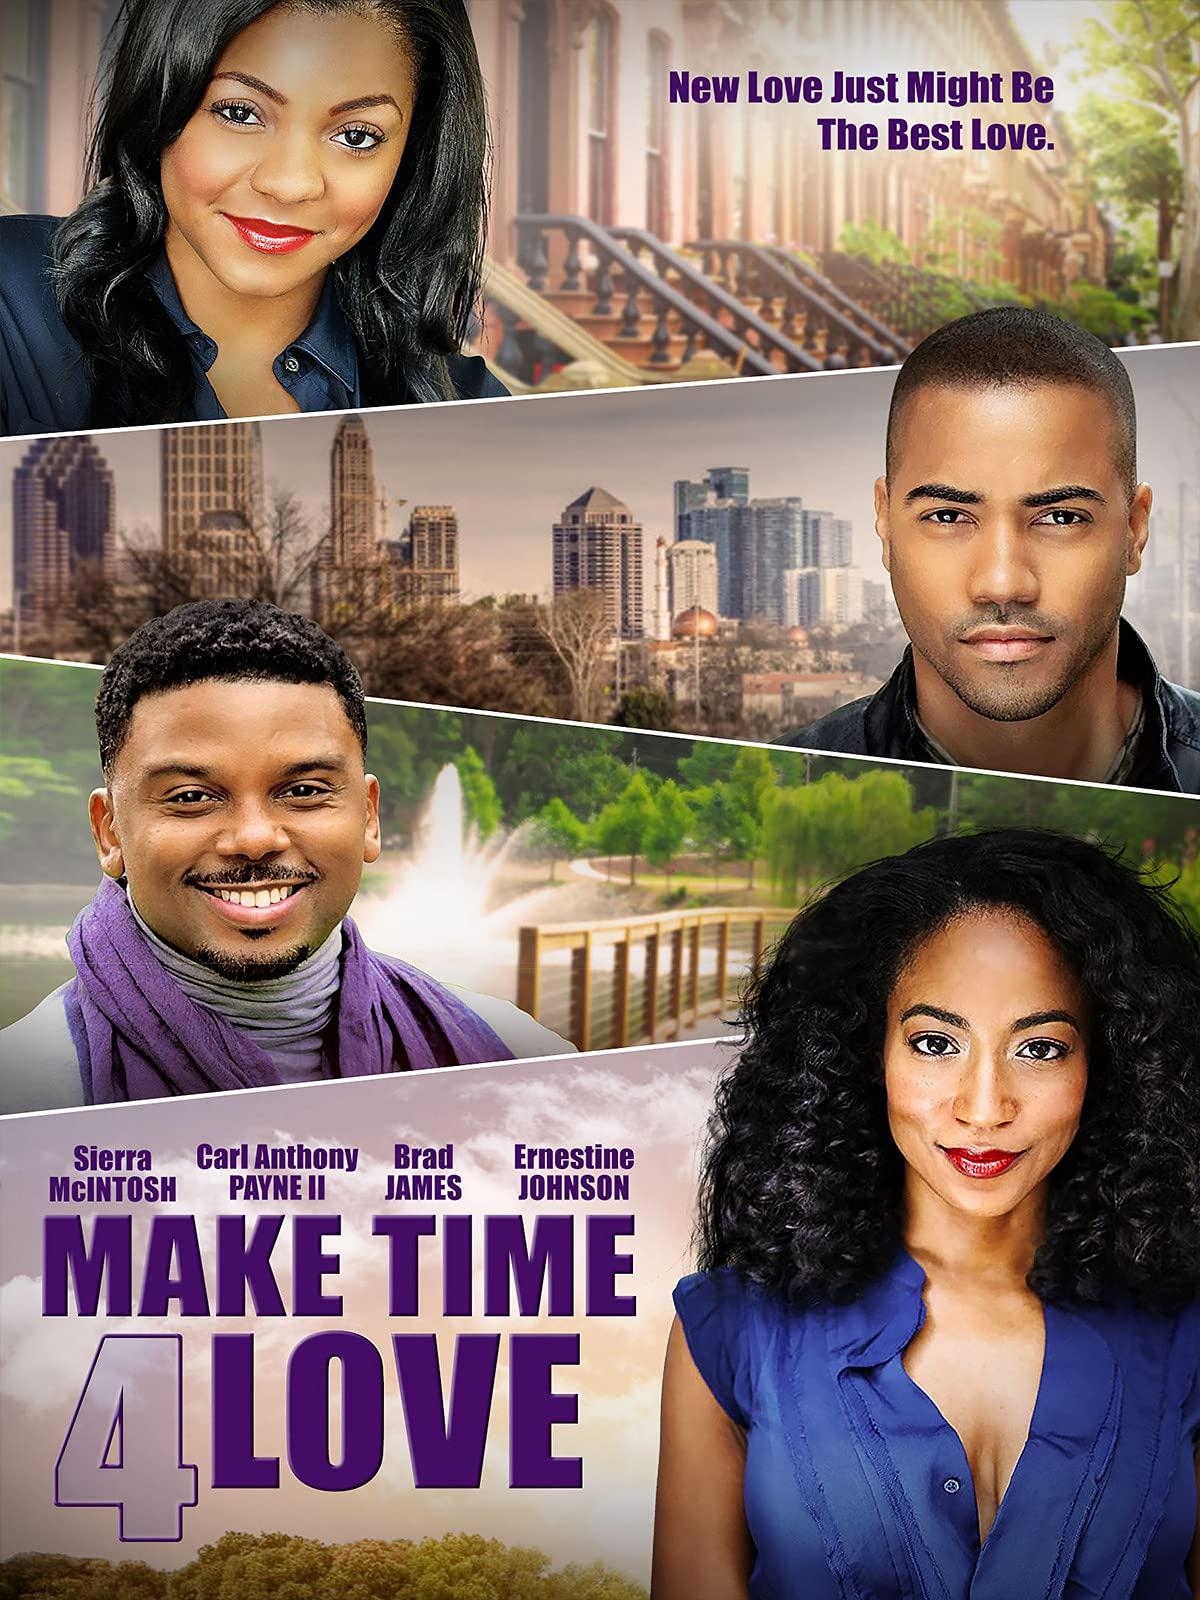 Make Time 4 Love